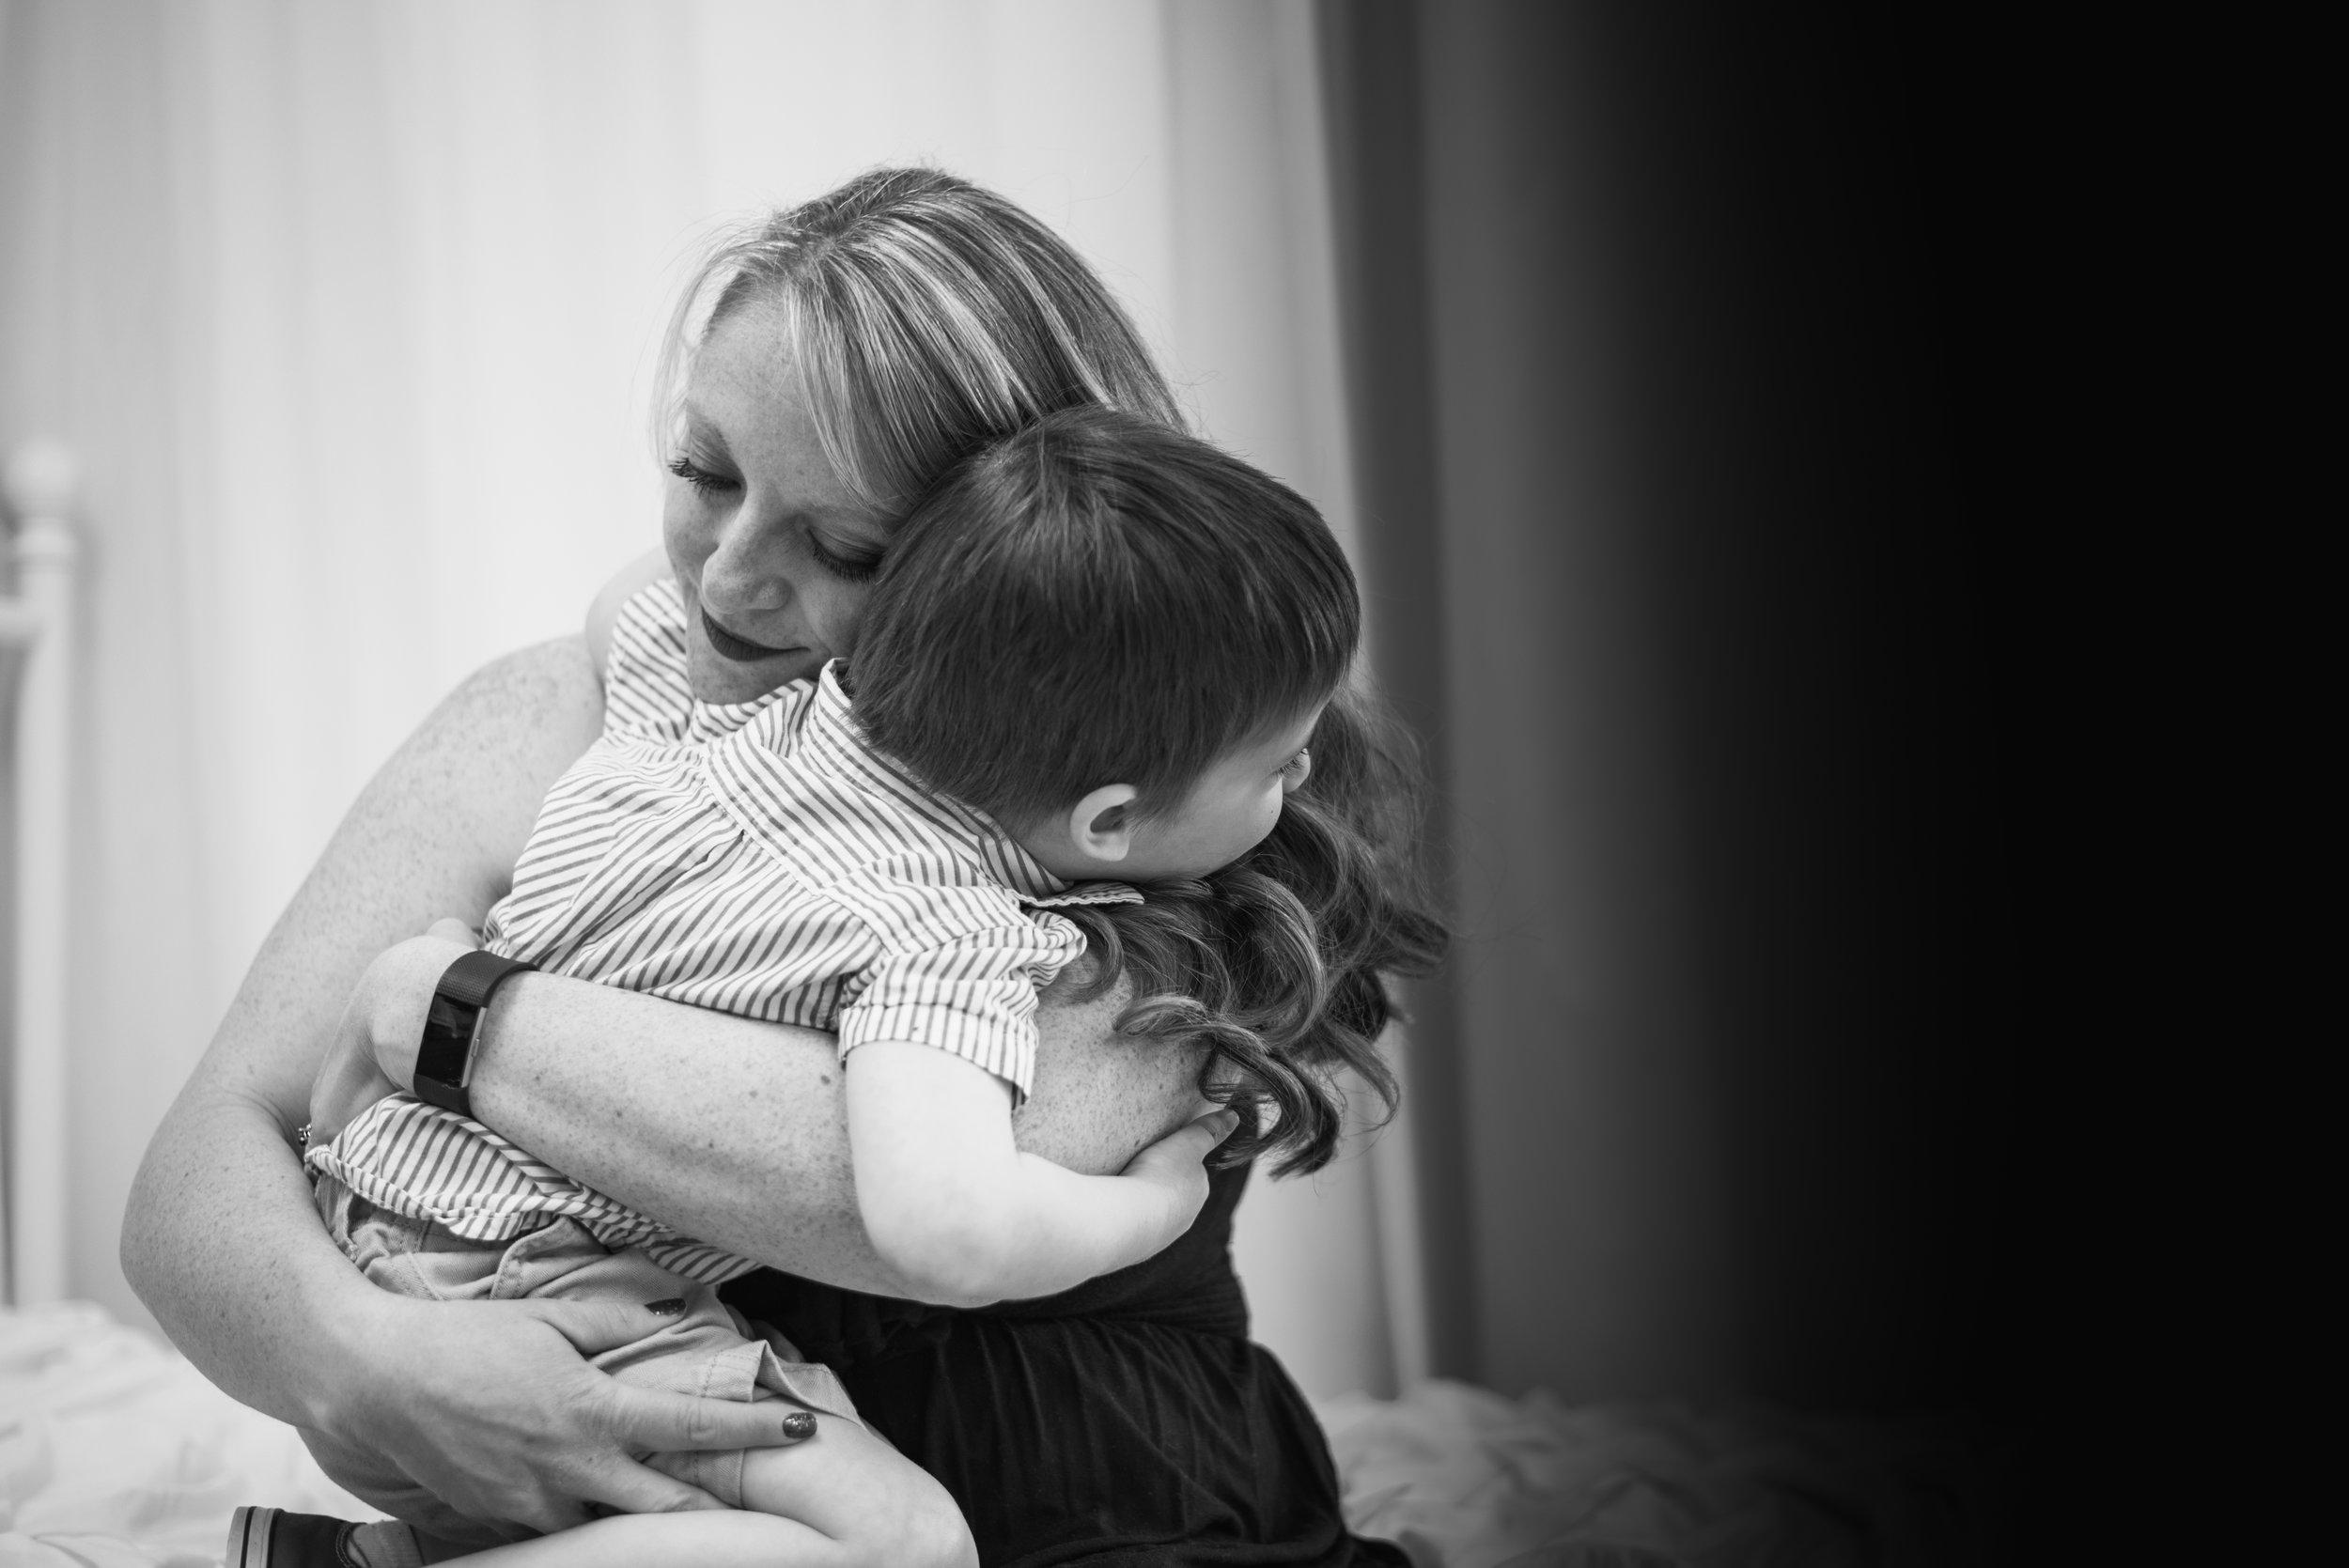 breastfeeding goals, normalize breastfeeding in colorado